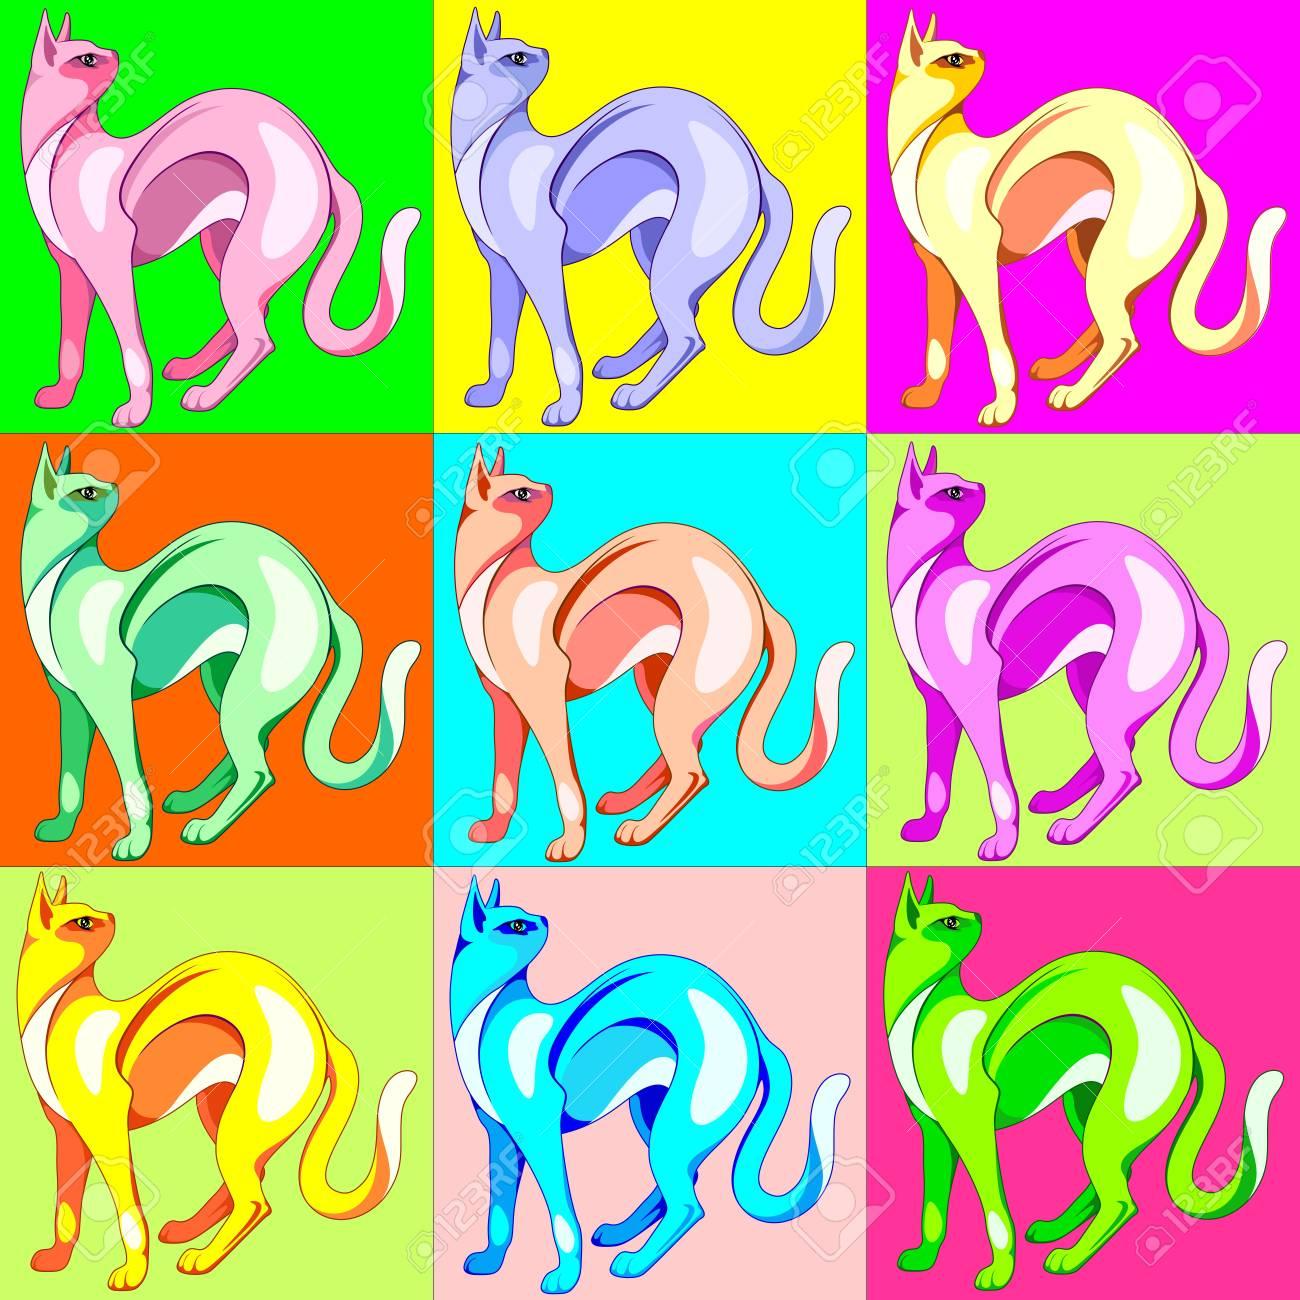 cat pop art rainbow colors royalty free cliparts vectors and stock